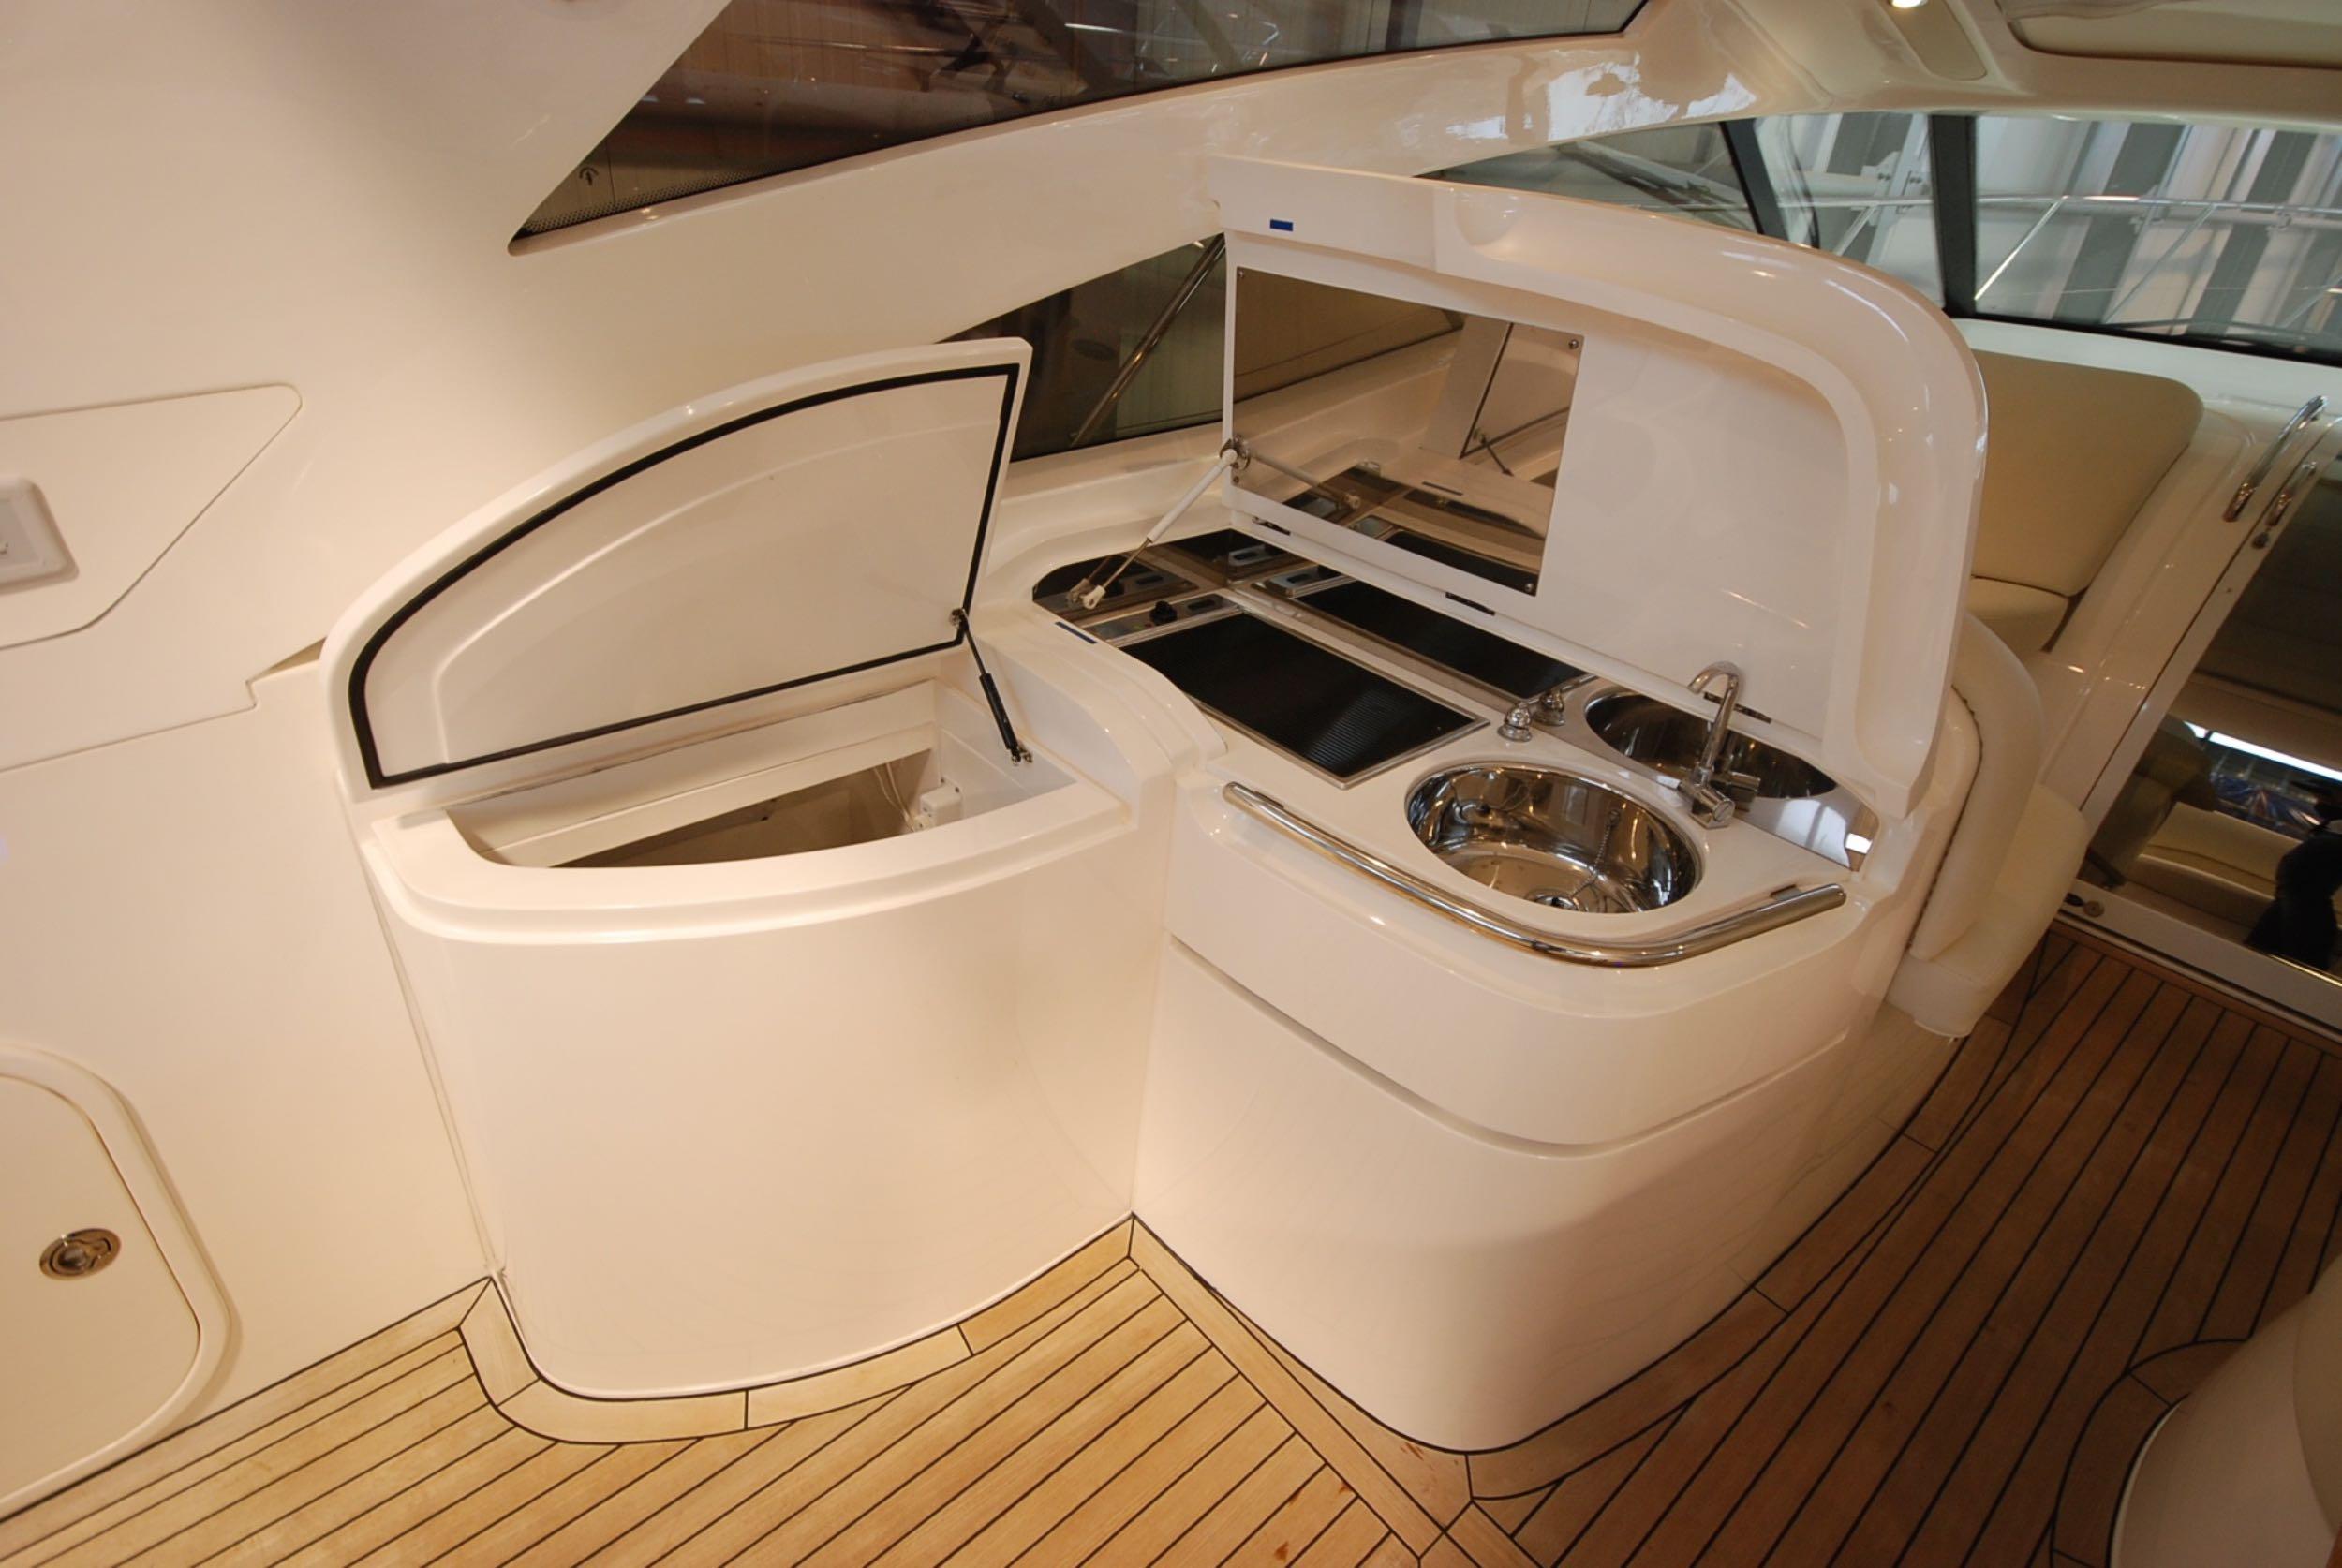 princess-yachts-v58-maestro-di-vita-for-sale-7.jpg